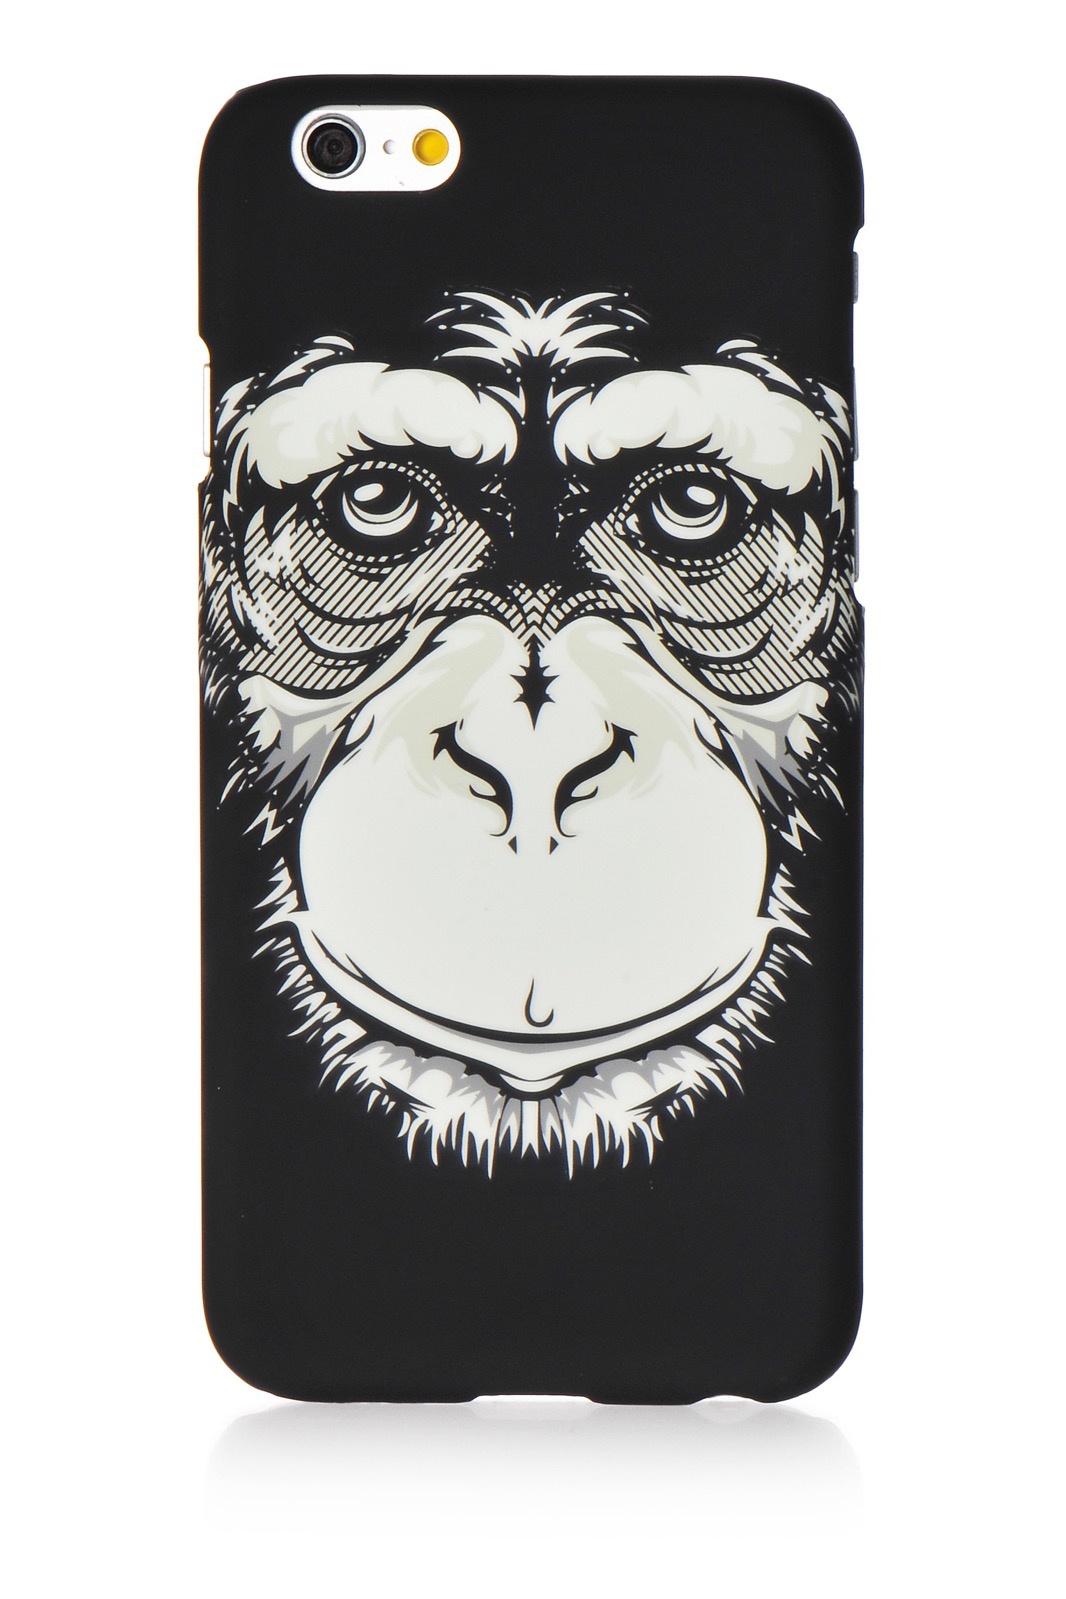 "Чехол для сотового телефона Gurdini Animal пластик soft touch стиль 2 для Apple iPhone 6 Plus/6S Plus 5.5"", черный"